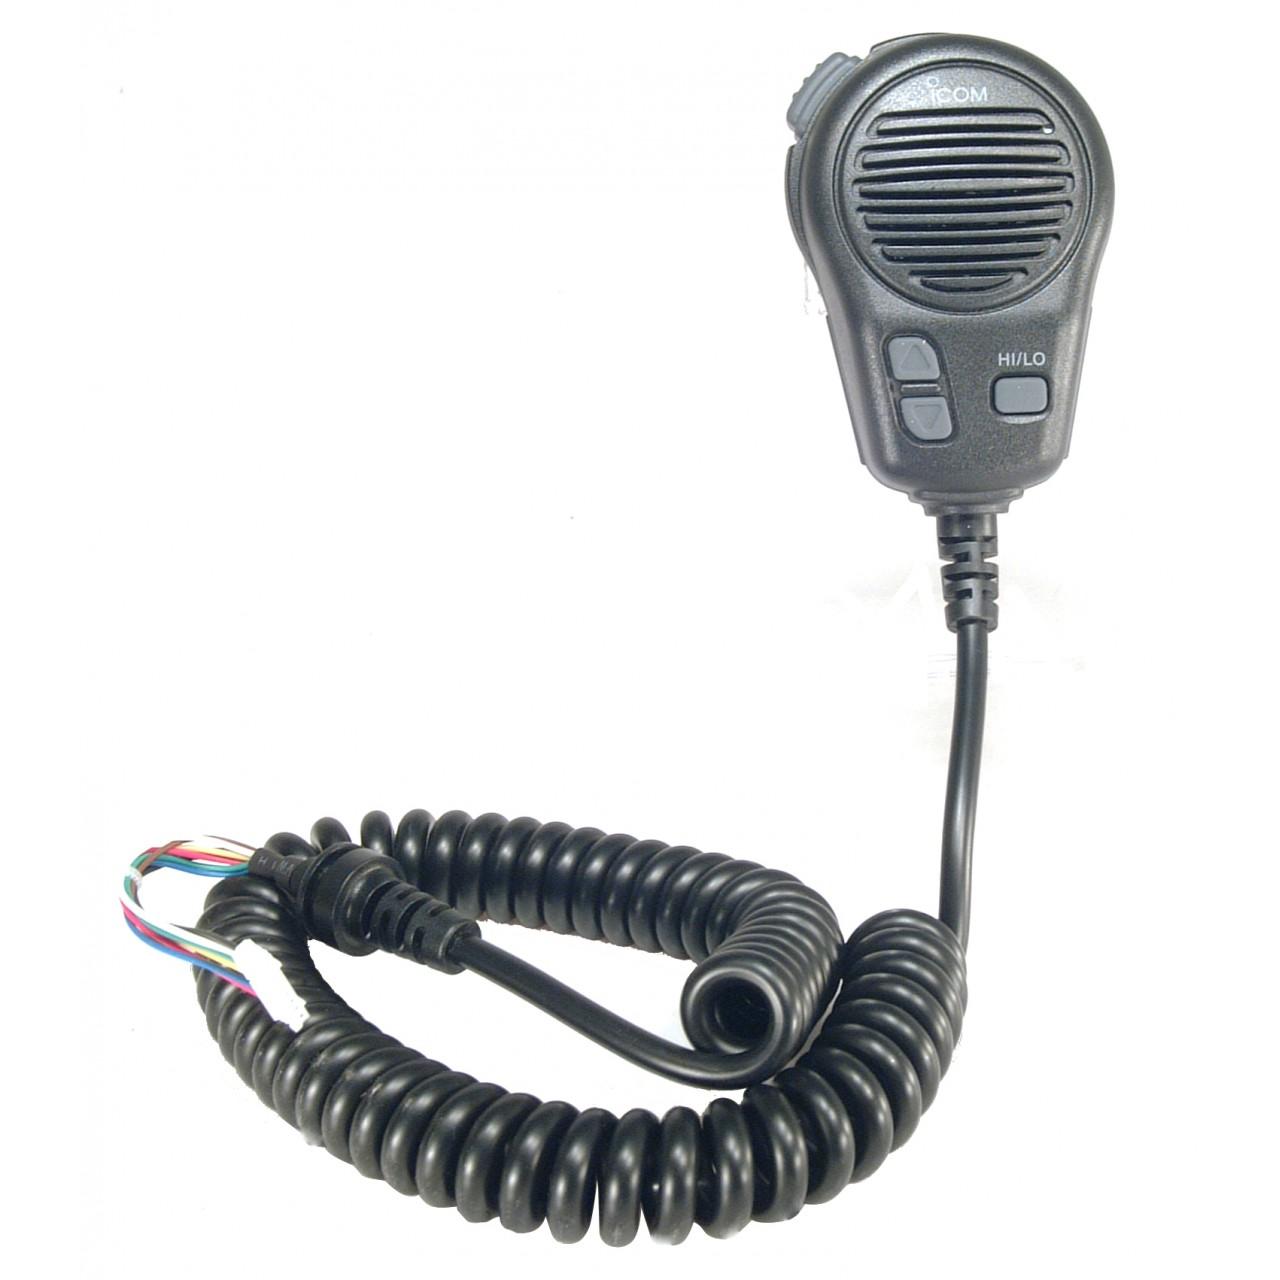 HM-196B Microphones - ICOM